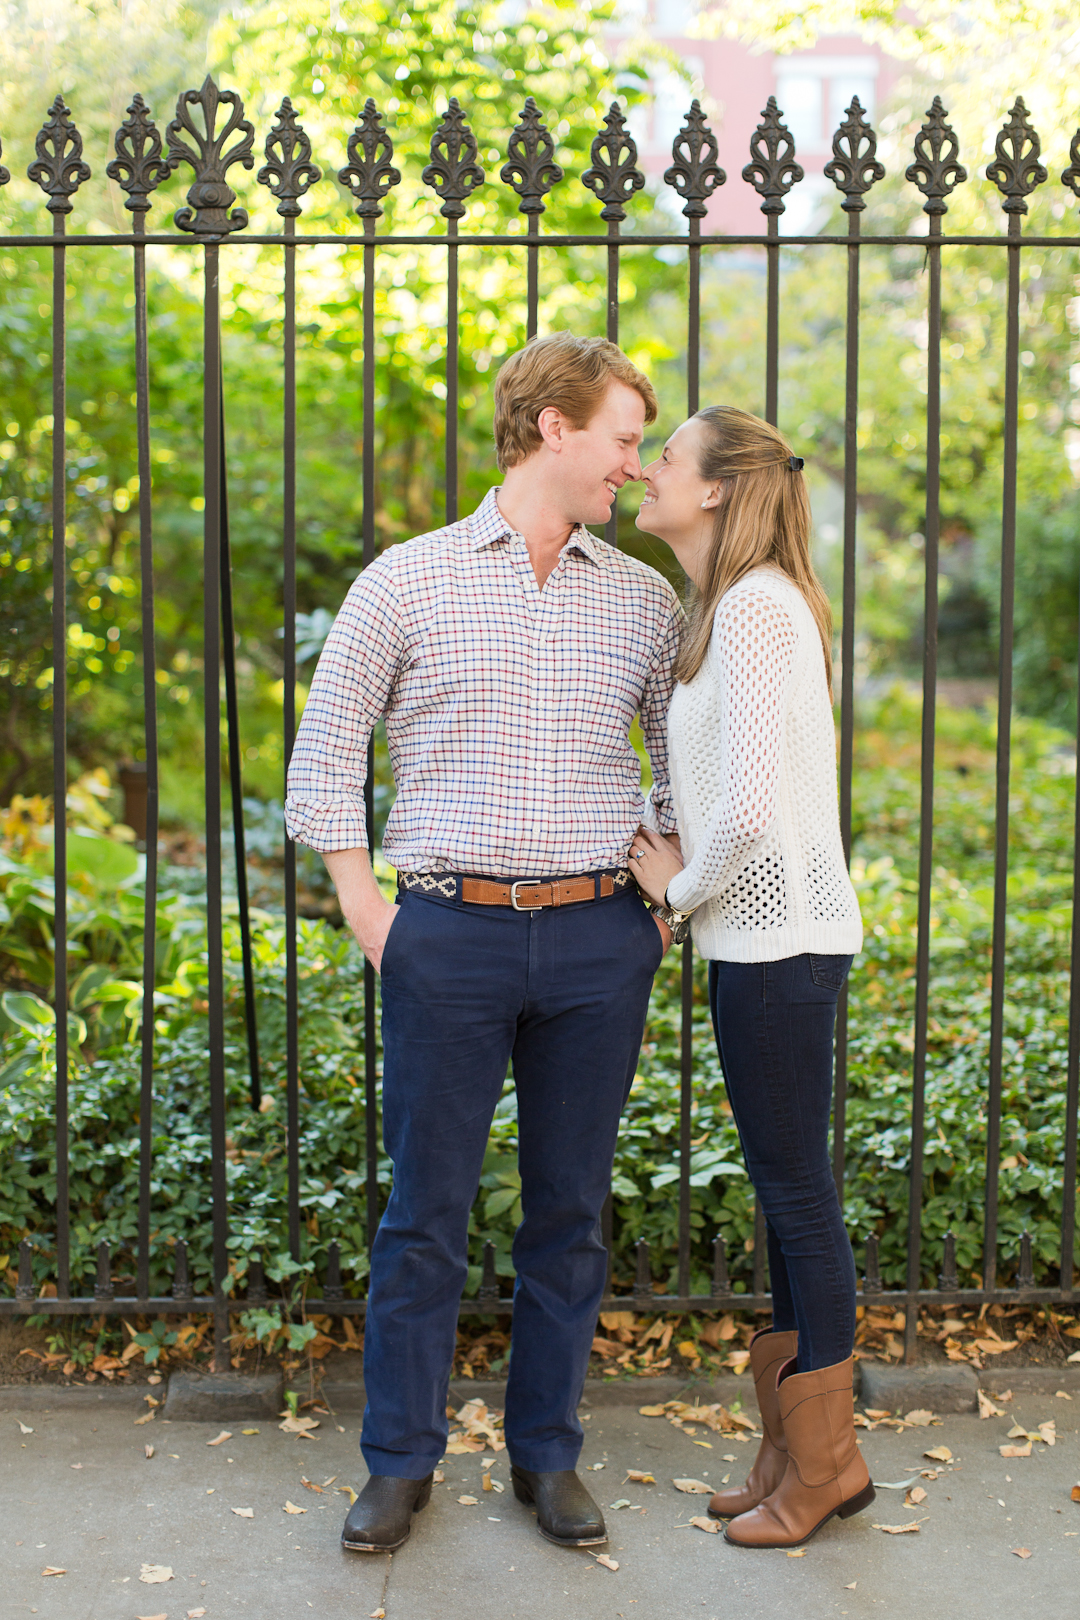 Melissa Kruse Photography - Megan & Tyler West Village Engagement Photos-77.jpg